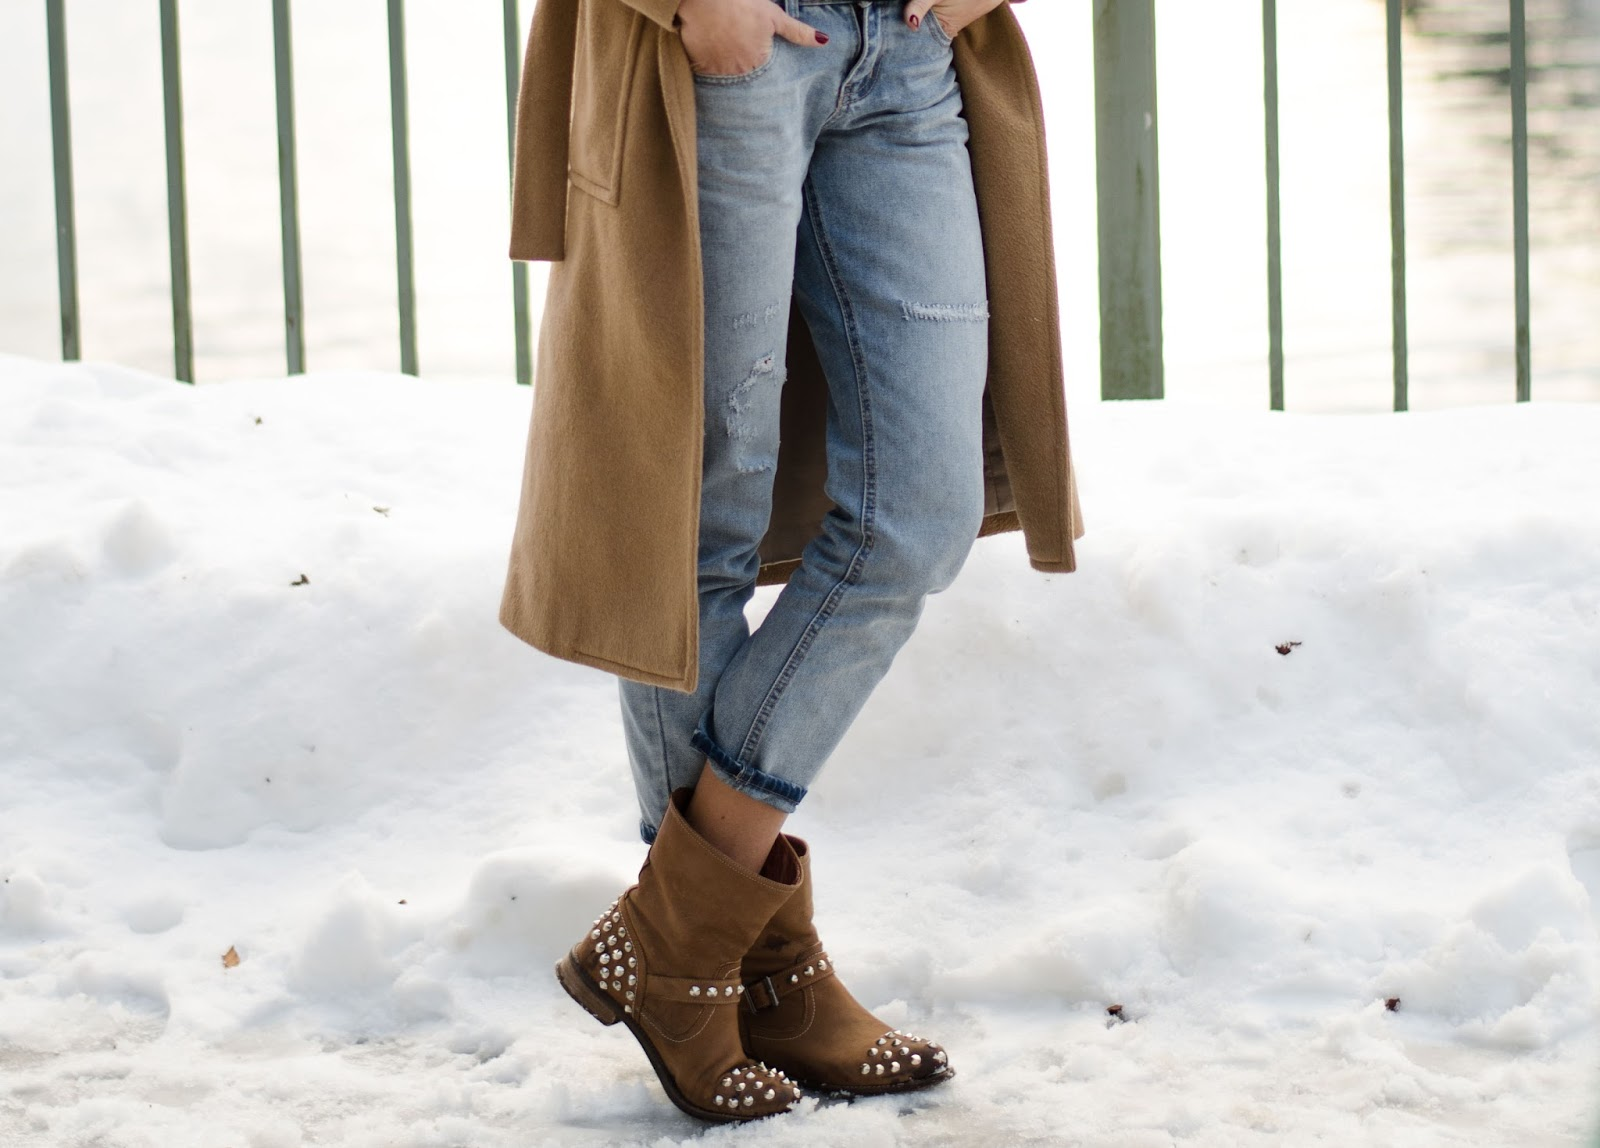 kristjaana mere boyfriend jeans chiara ferragni studded ankle boots